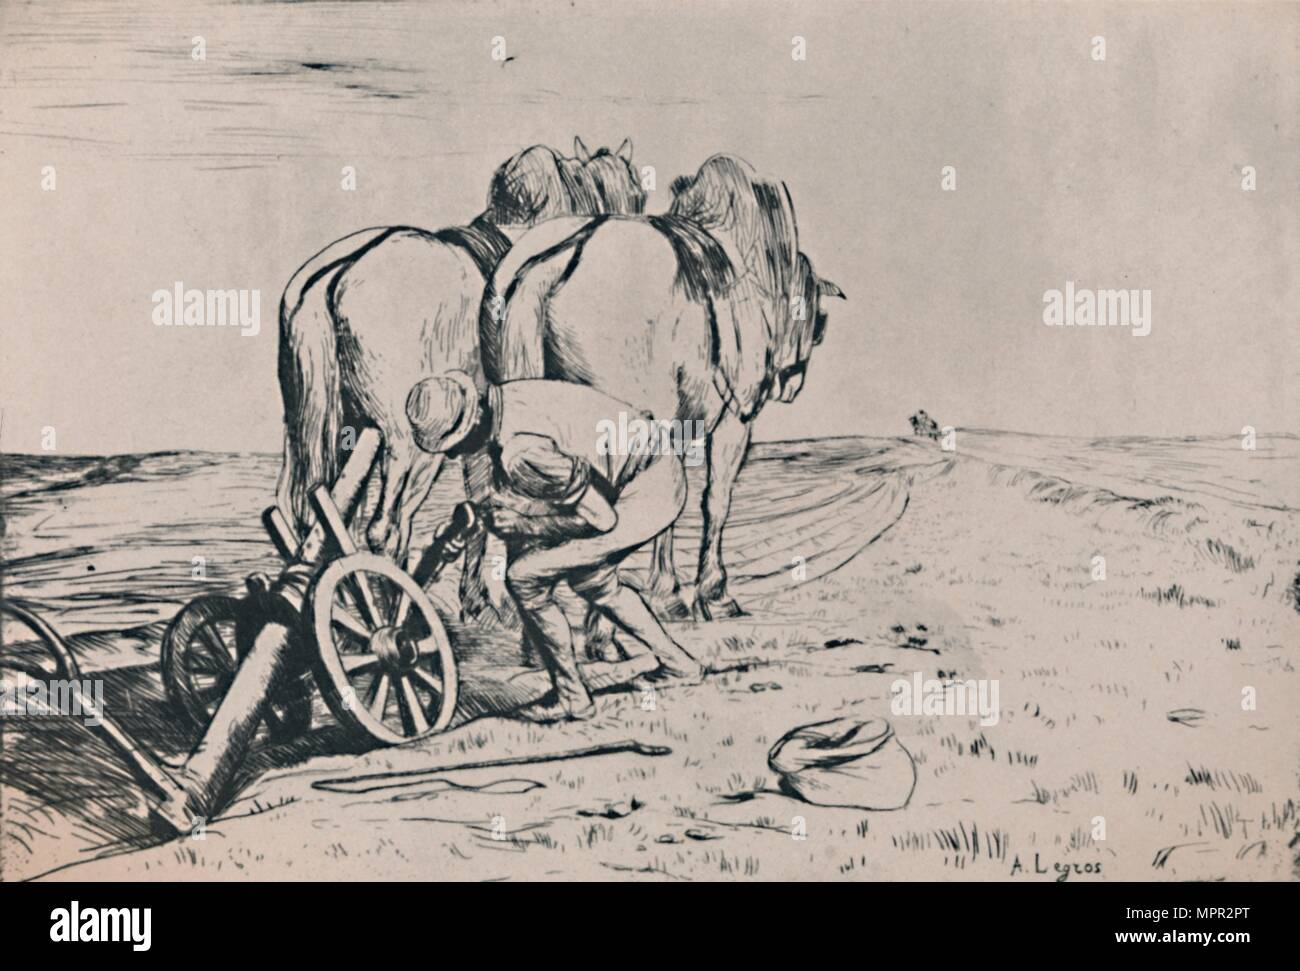 'The Plough', mid-late 19th century, (1946). Artist: Alphonse Legros. - Stock Image